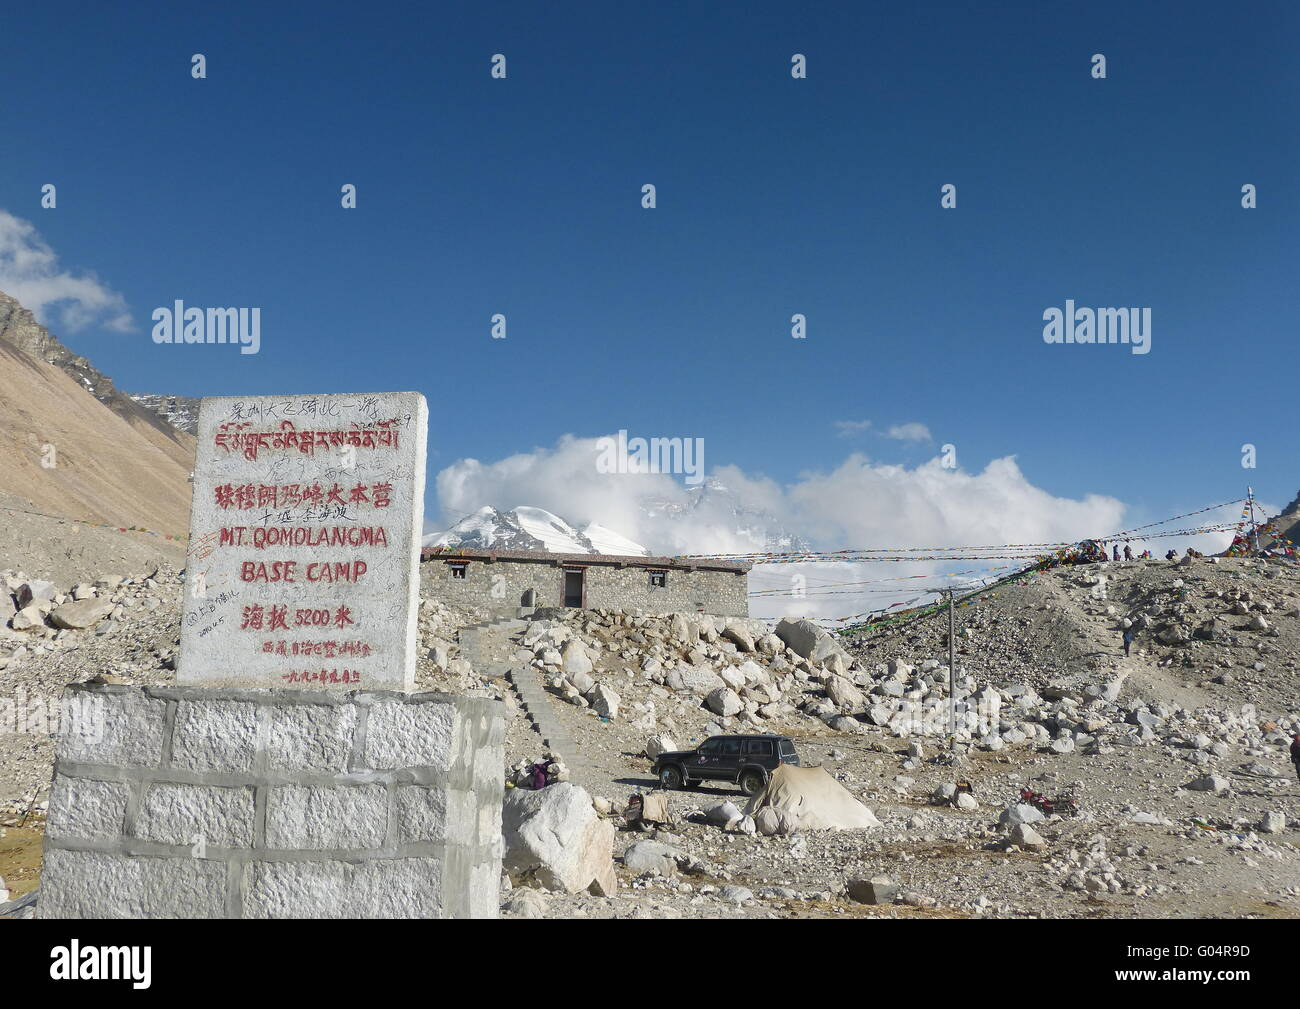 Elevation milestone at Mount Everest Base Camp indicating altitude of 5200 above sea level on the Tibet side. - Stock Image